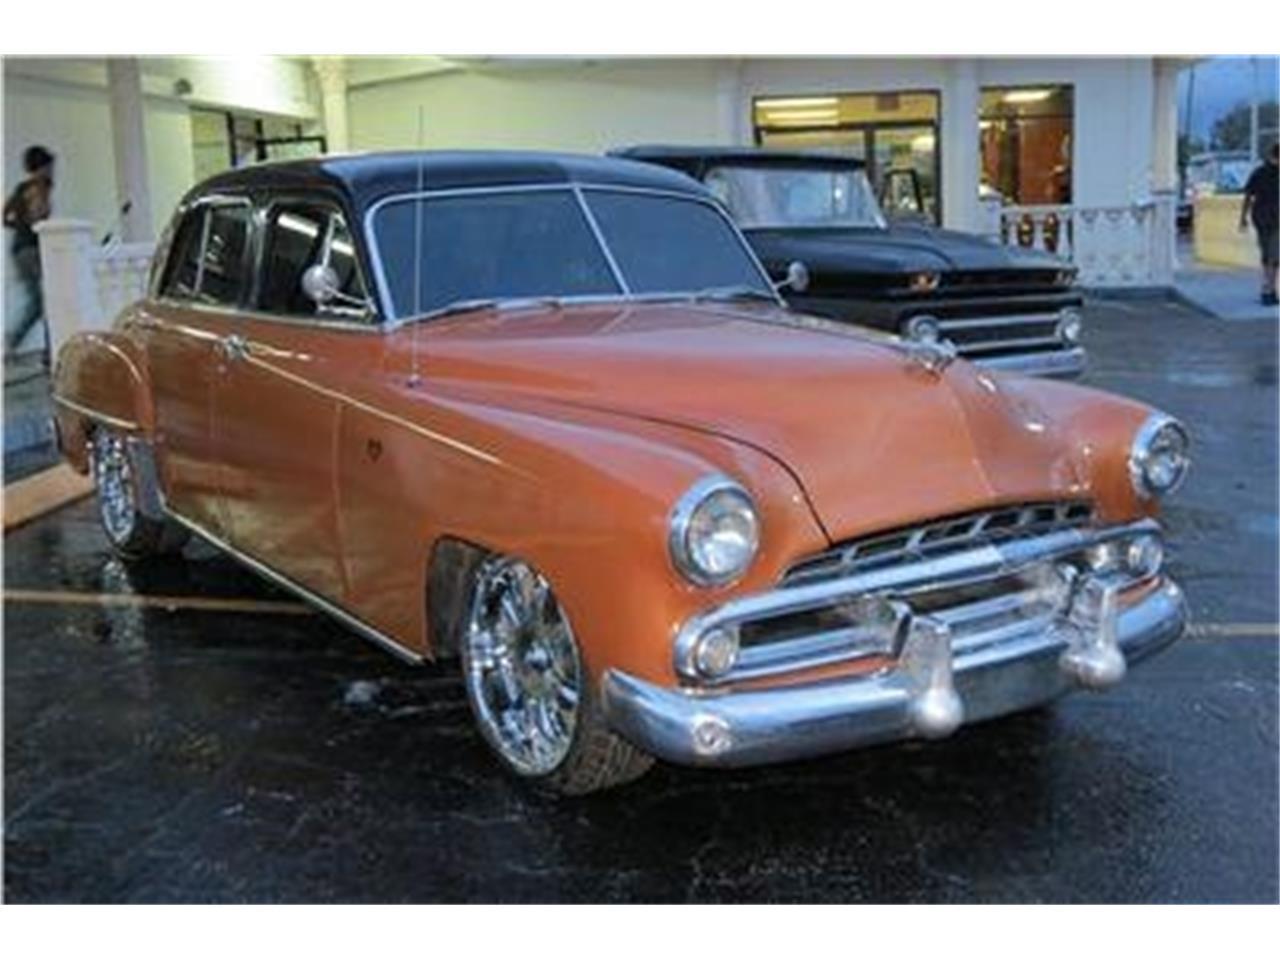 Dodge Dealers In Az >> 1951 Dodge 4-Dr Sedan for Sale   ClassicCars.com   CC-427370